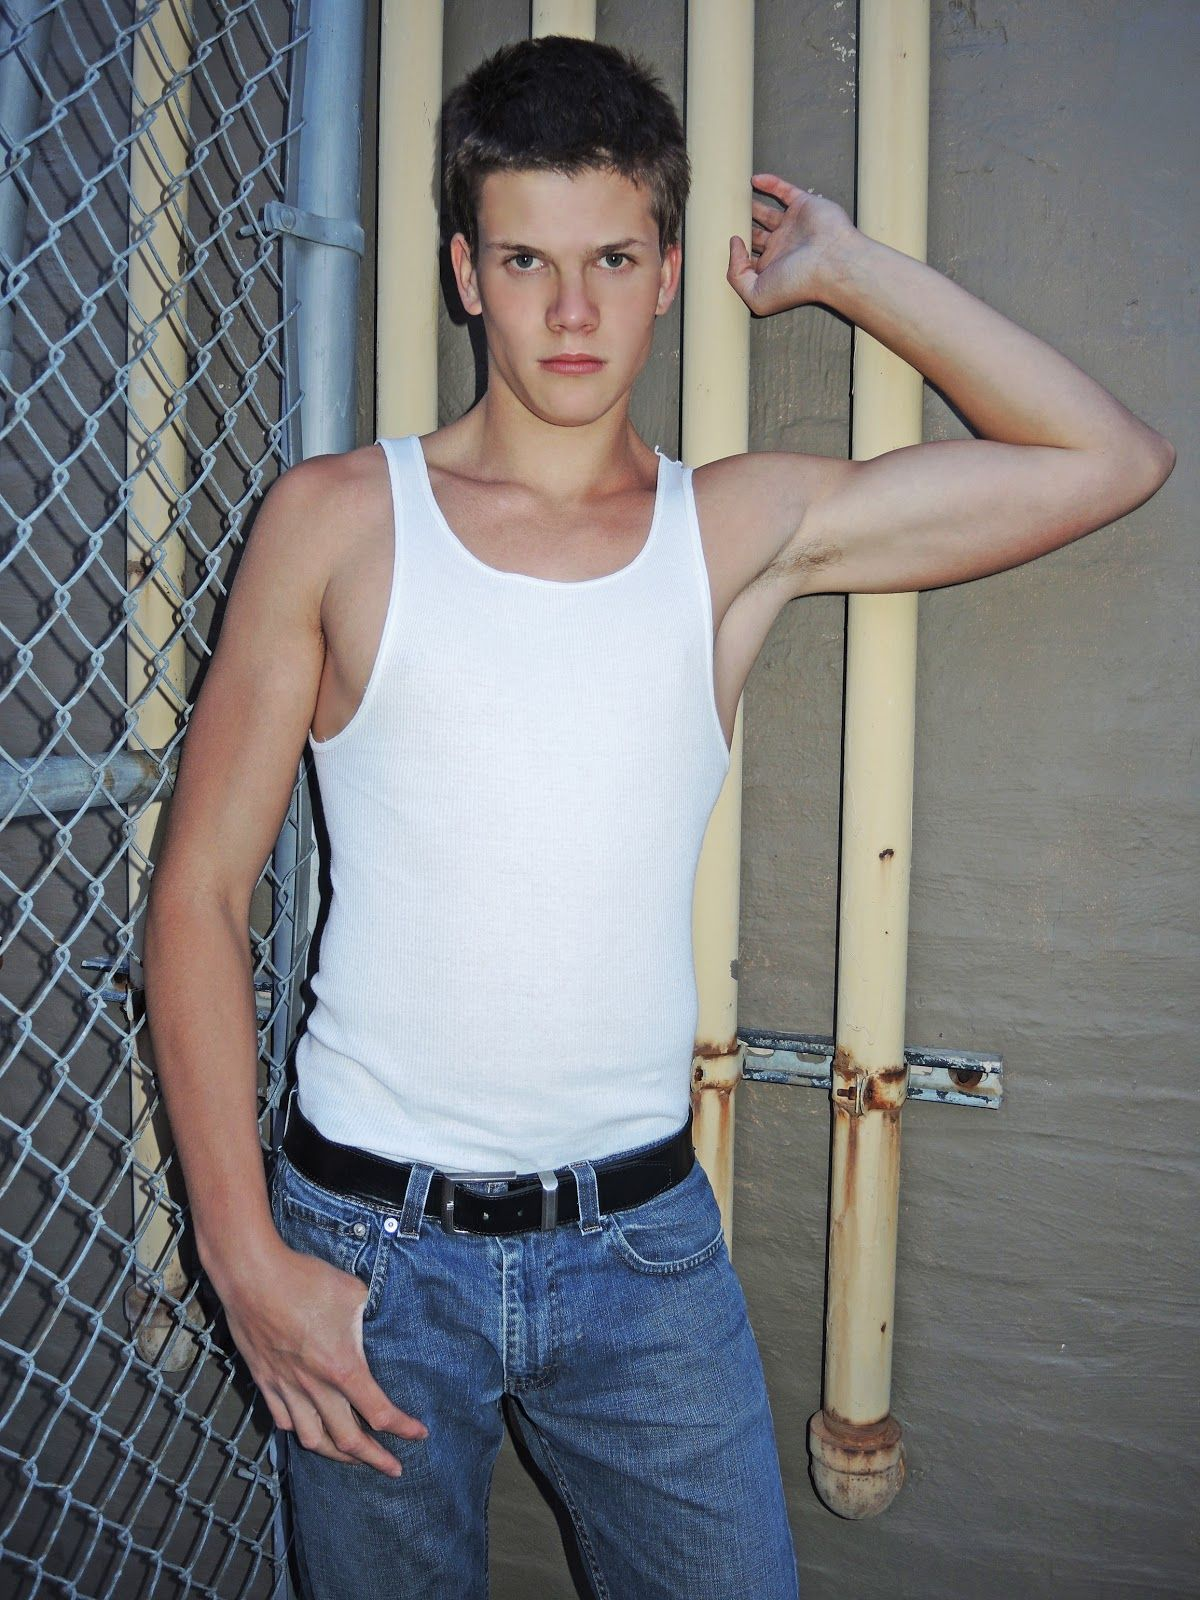 White Boy Swag On Tumblr: Ian Sheridan, Skinny White Boy